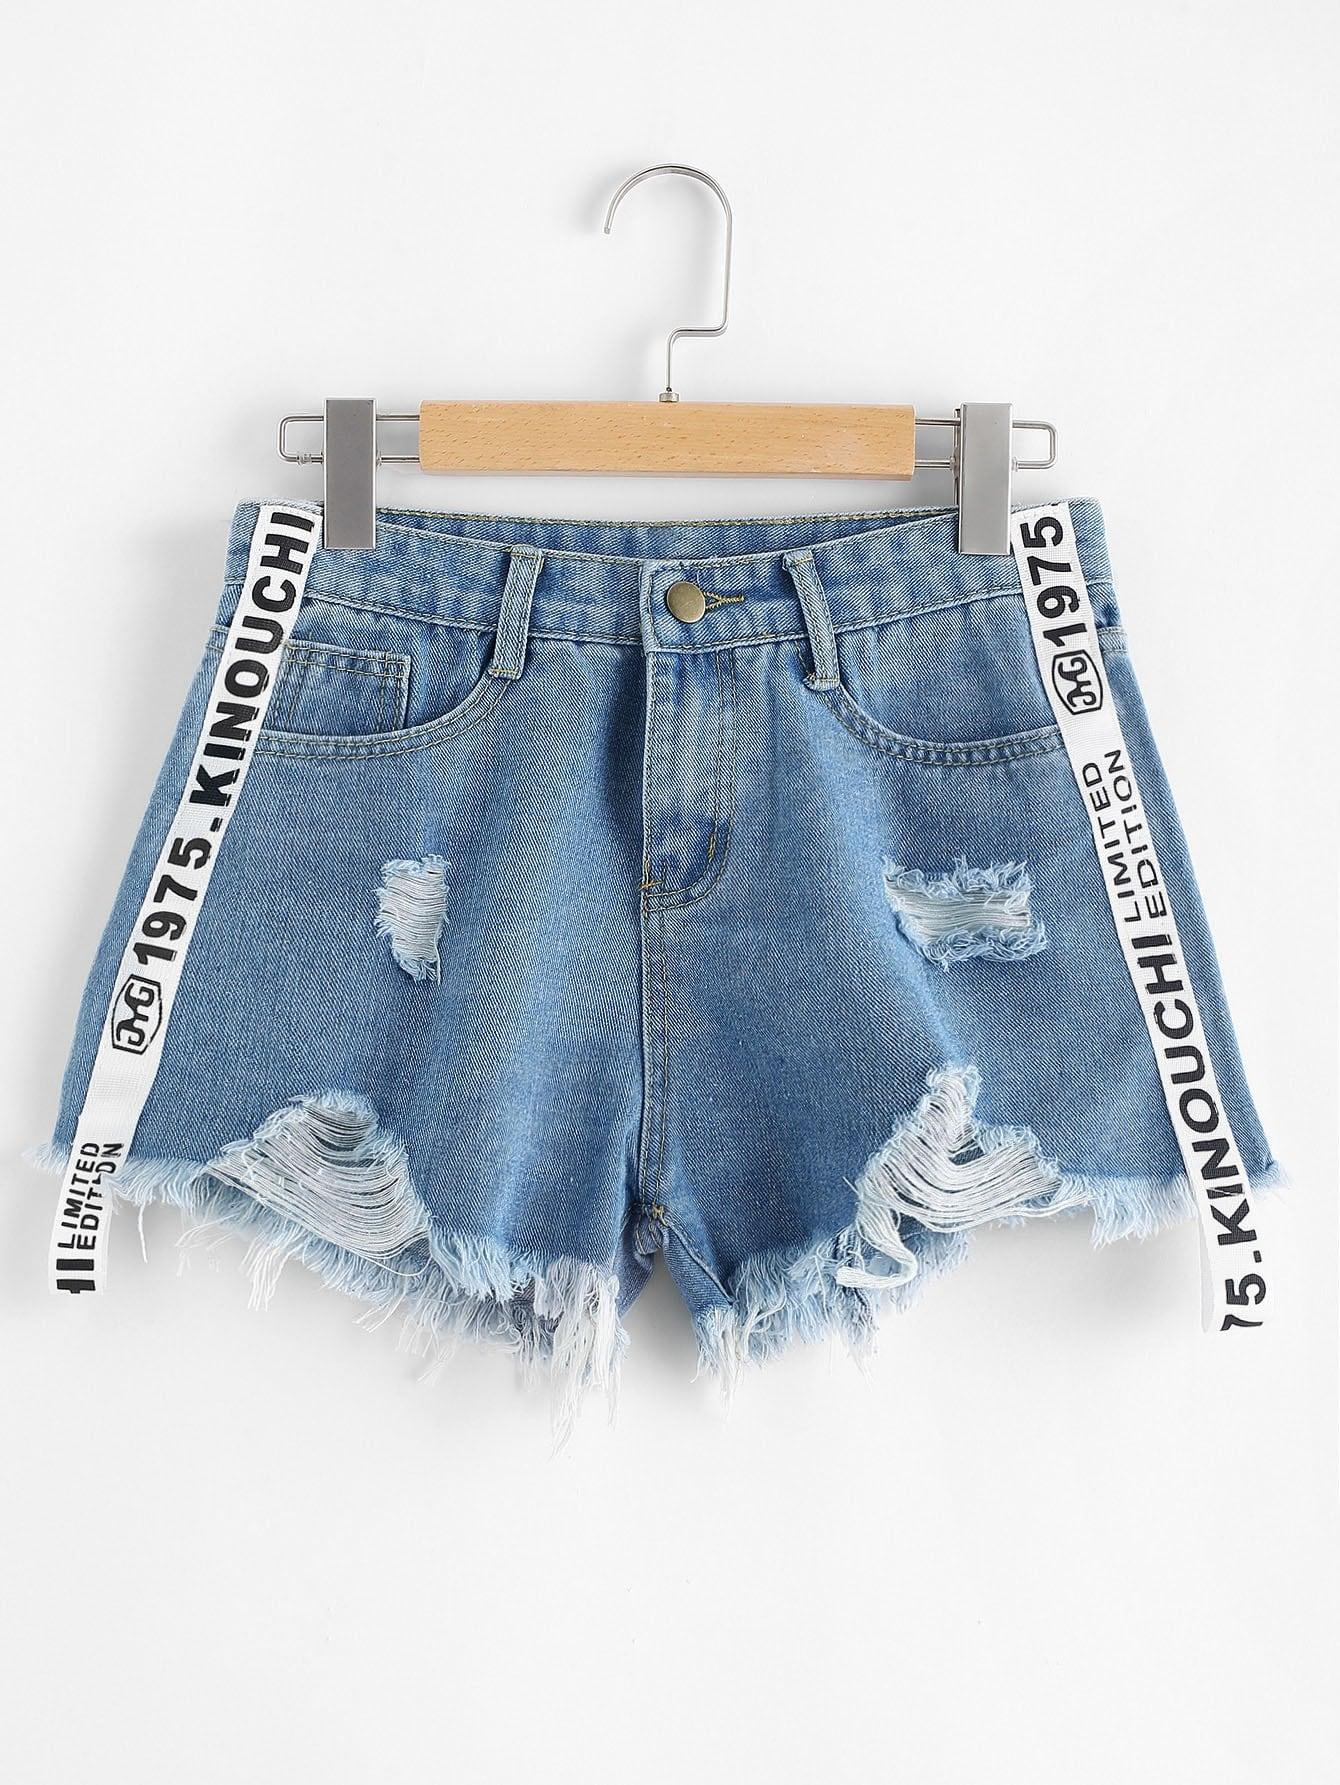 Frayed Hem Ripped Letter Denim Shorts chic pocket design ripped hem denim shorts for women